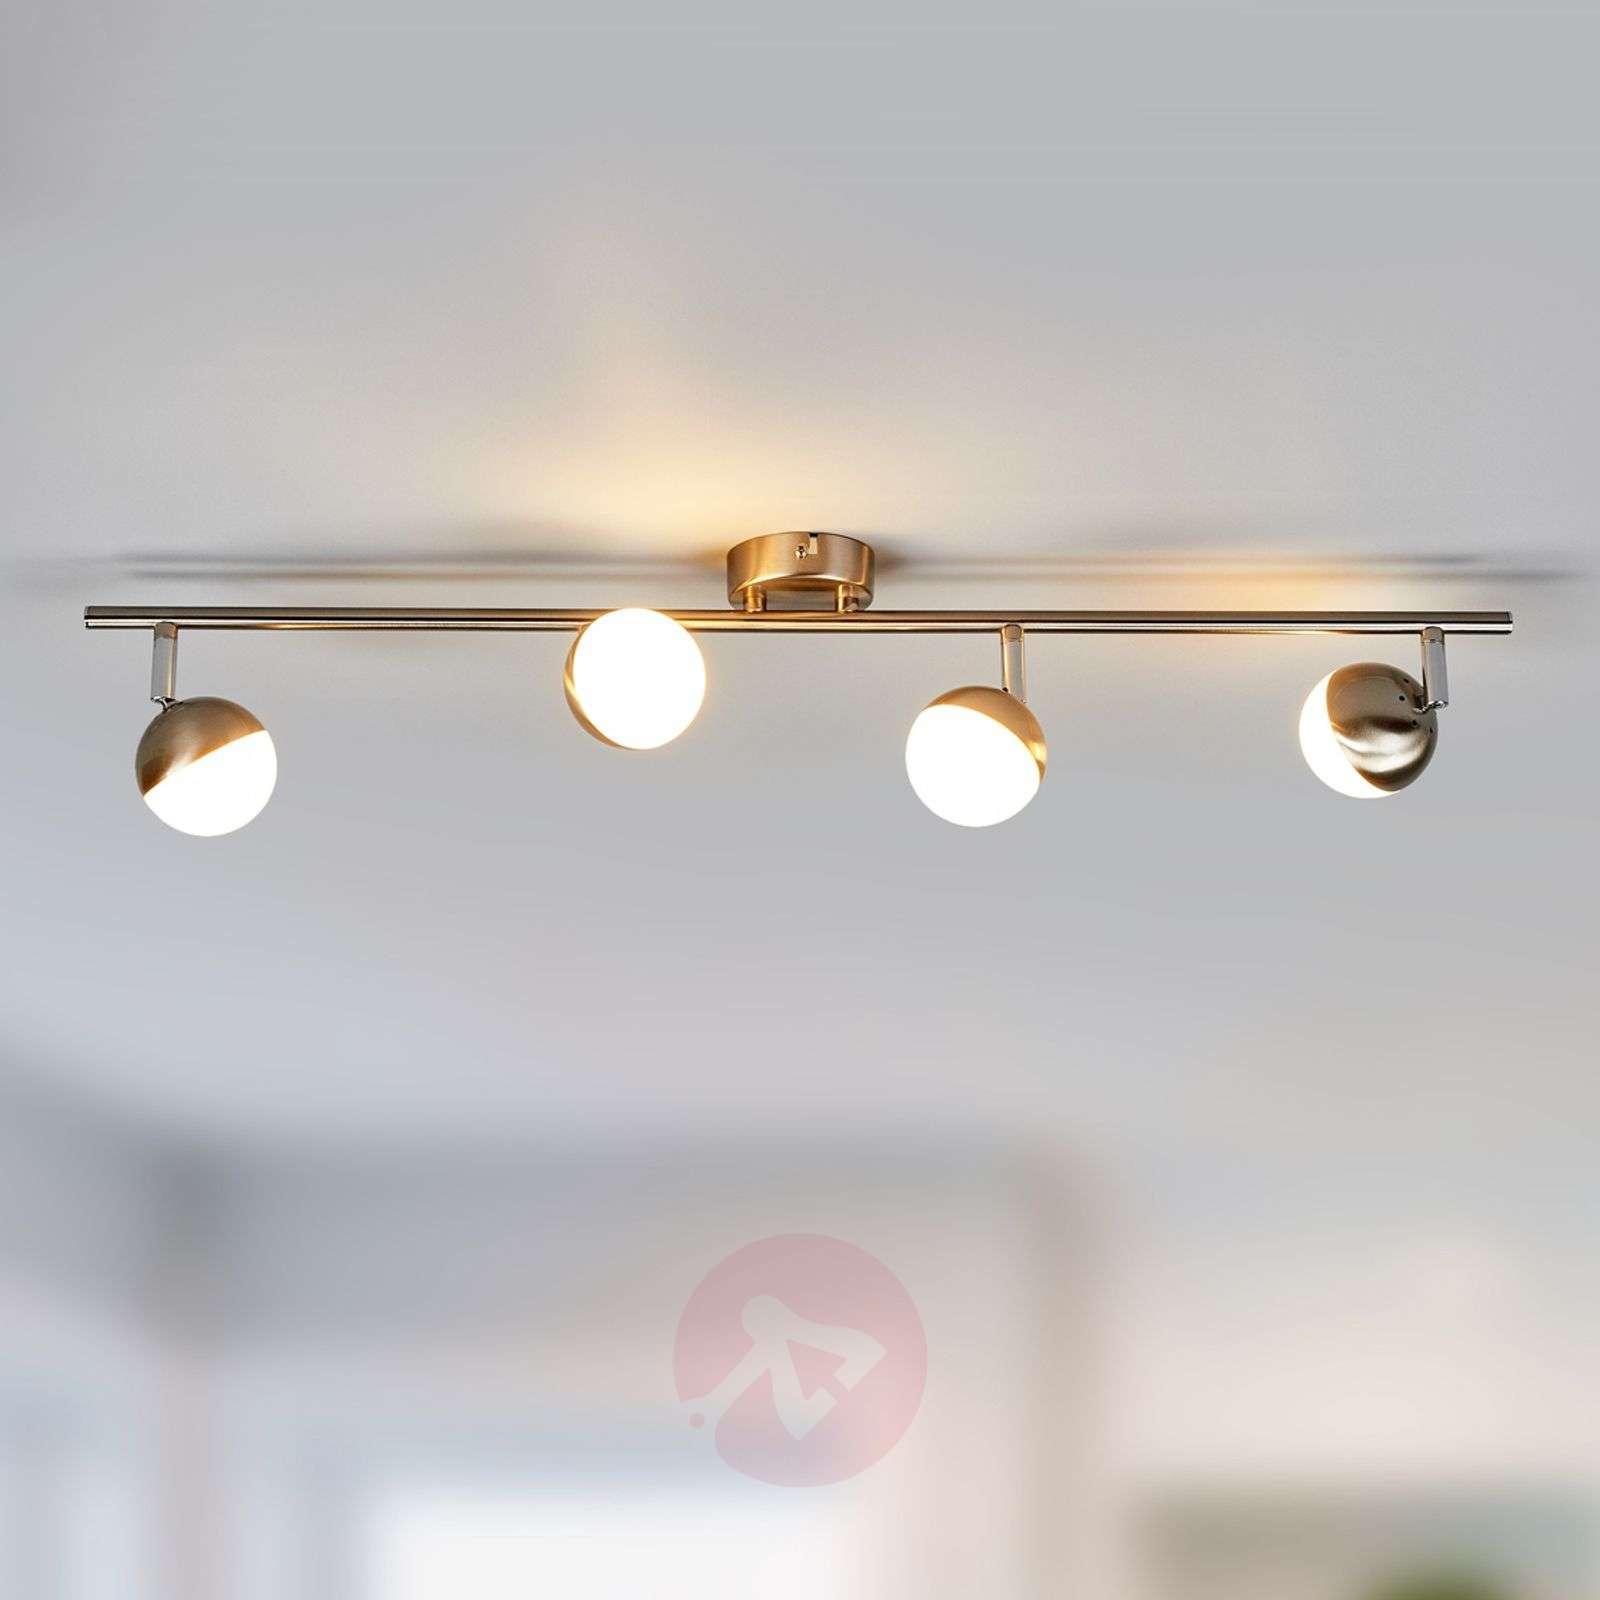 Discreet LED ceiling lamp Jonne, matt nickel-9987058-04